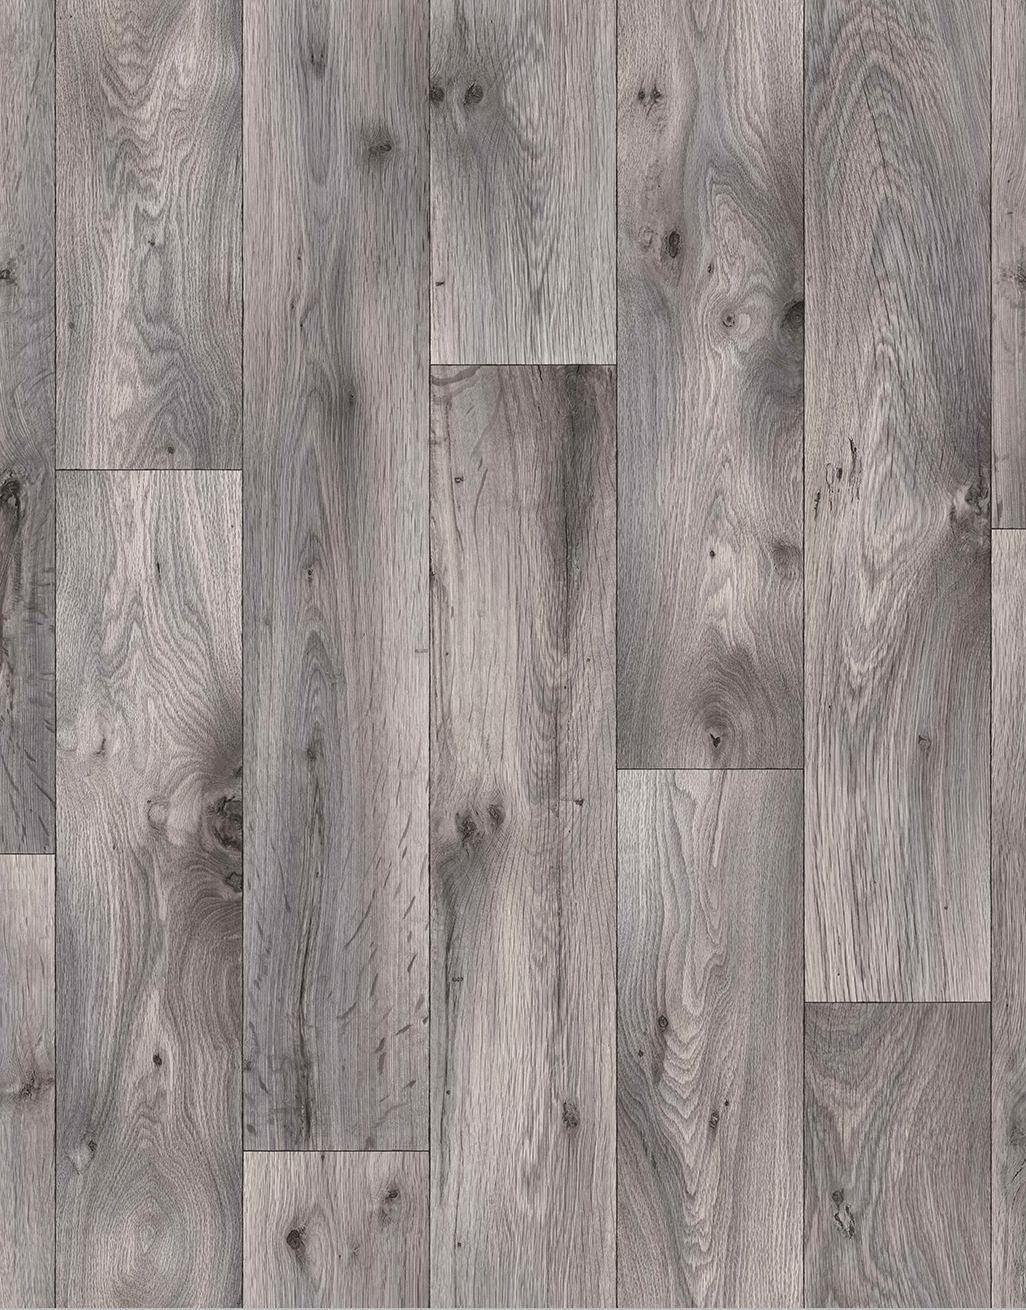 Rhodes Distressed Oak Flooring